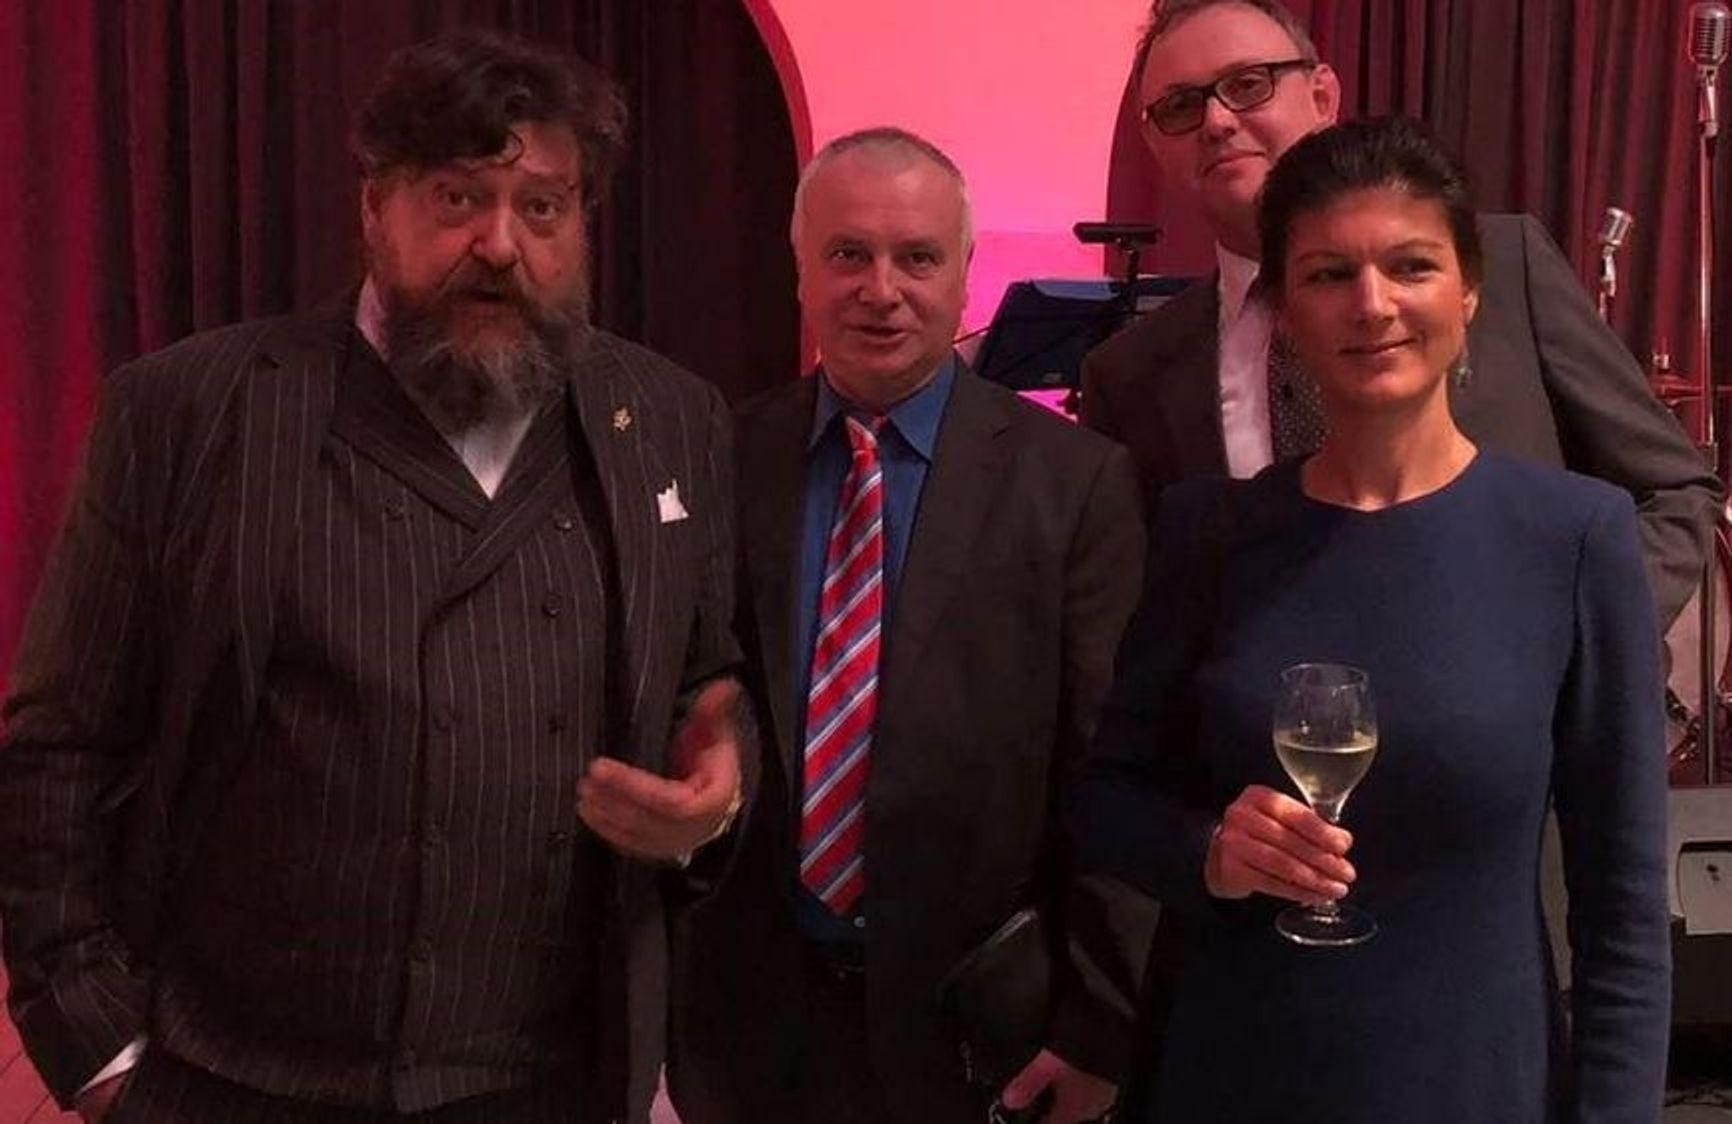 Konstantin Loskutnikov (Bossner), Alexander Rahr, and Sahra Wagenknecht (Die Linke)